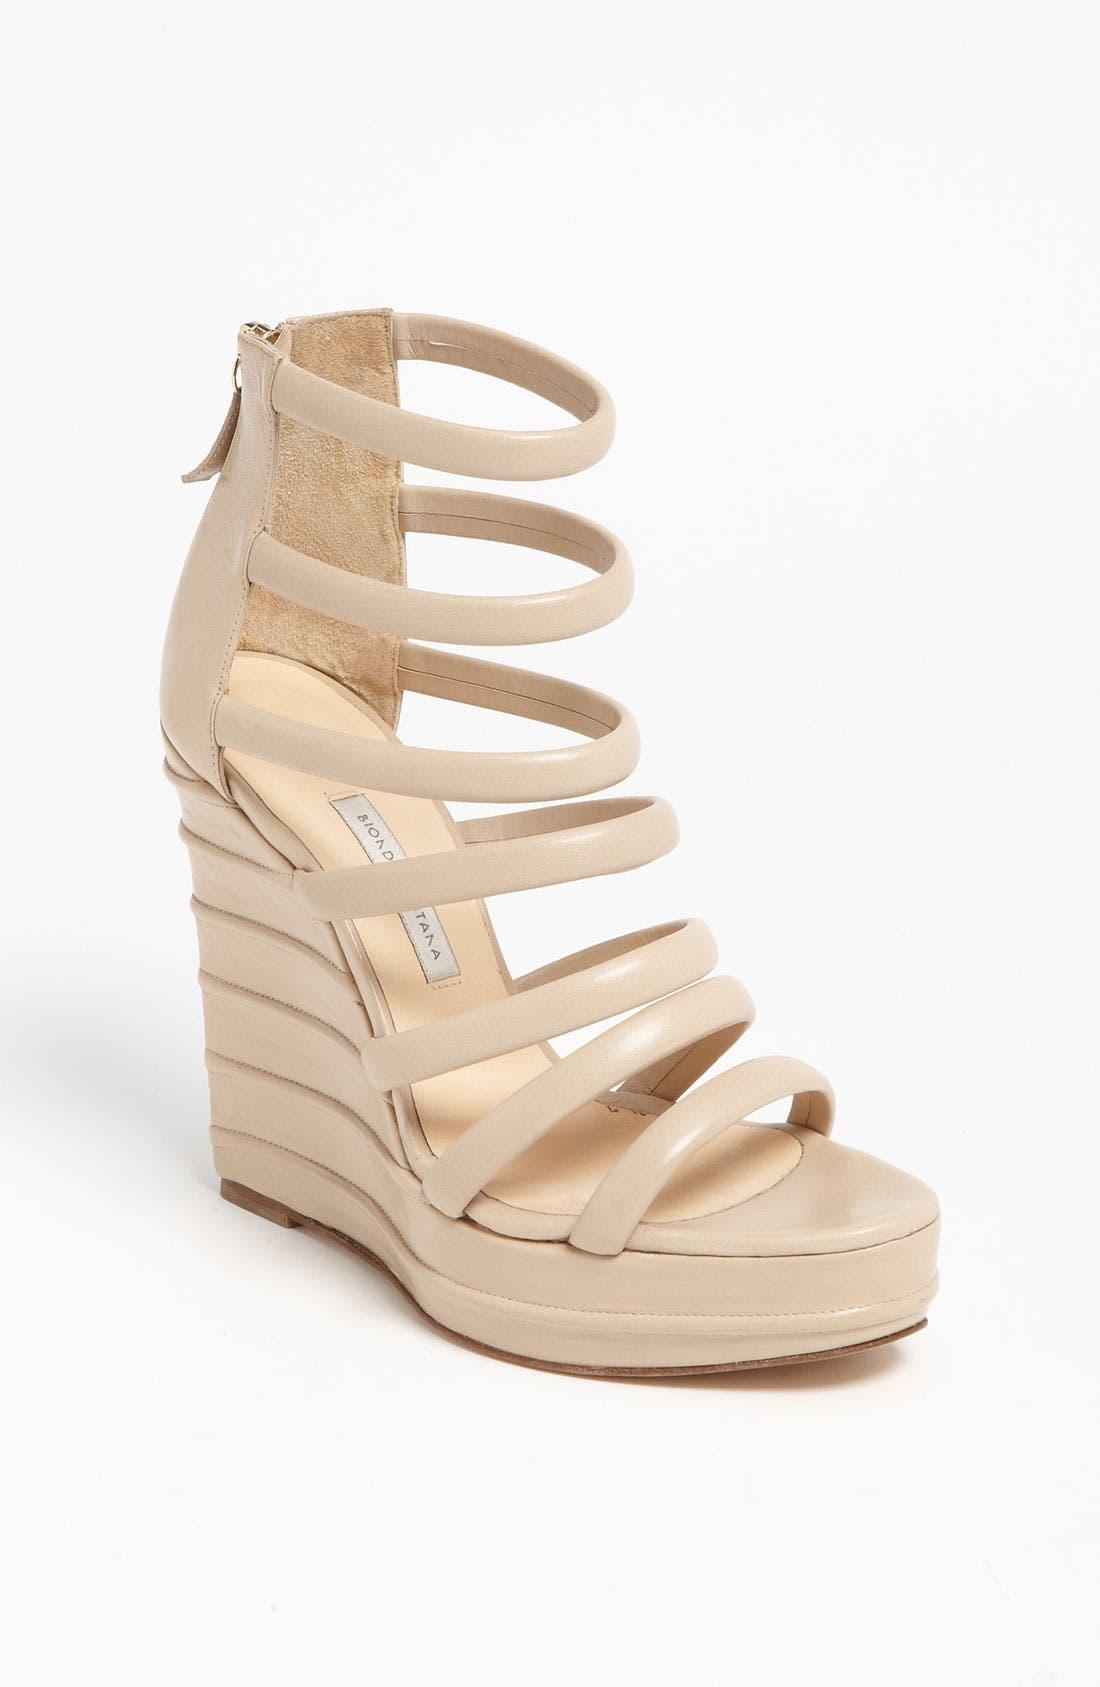 Alternate Image 1 Selected - Bionda Castana Zip Sandal